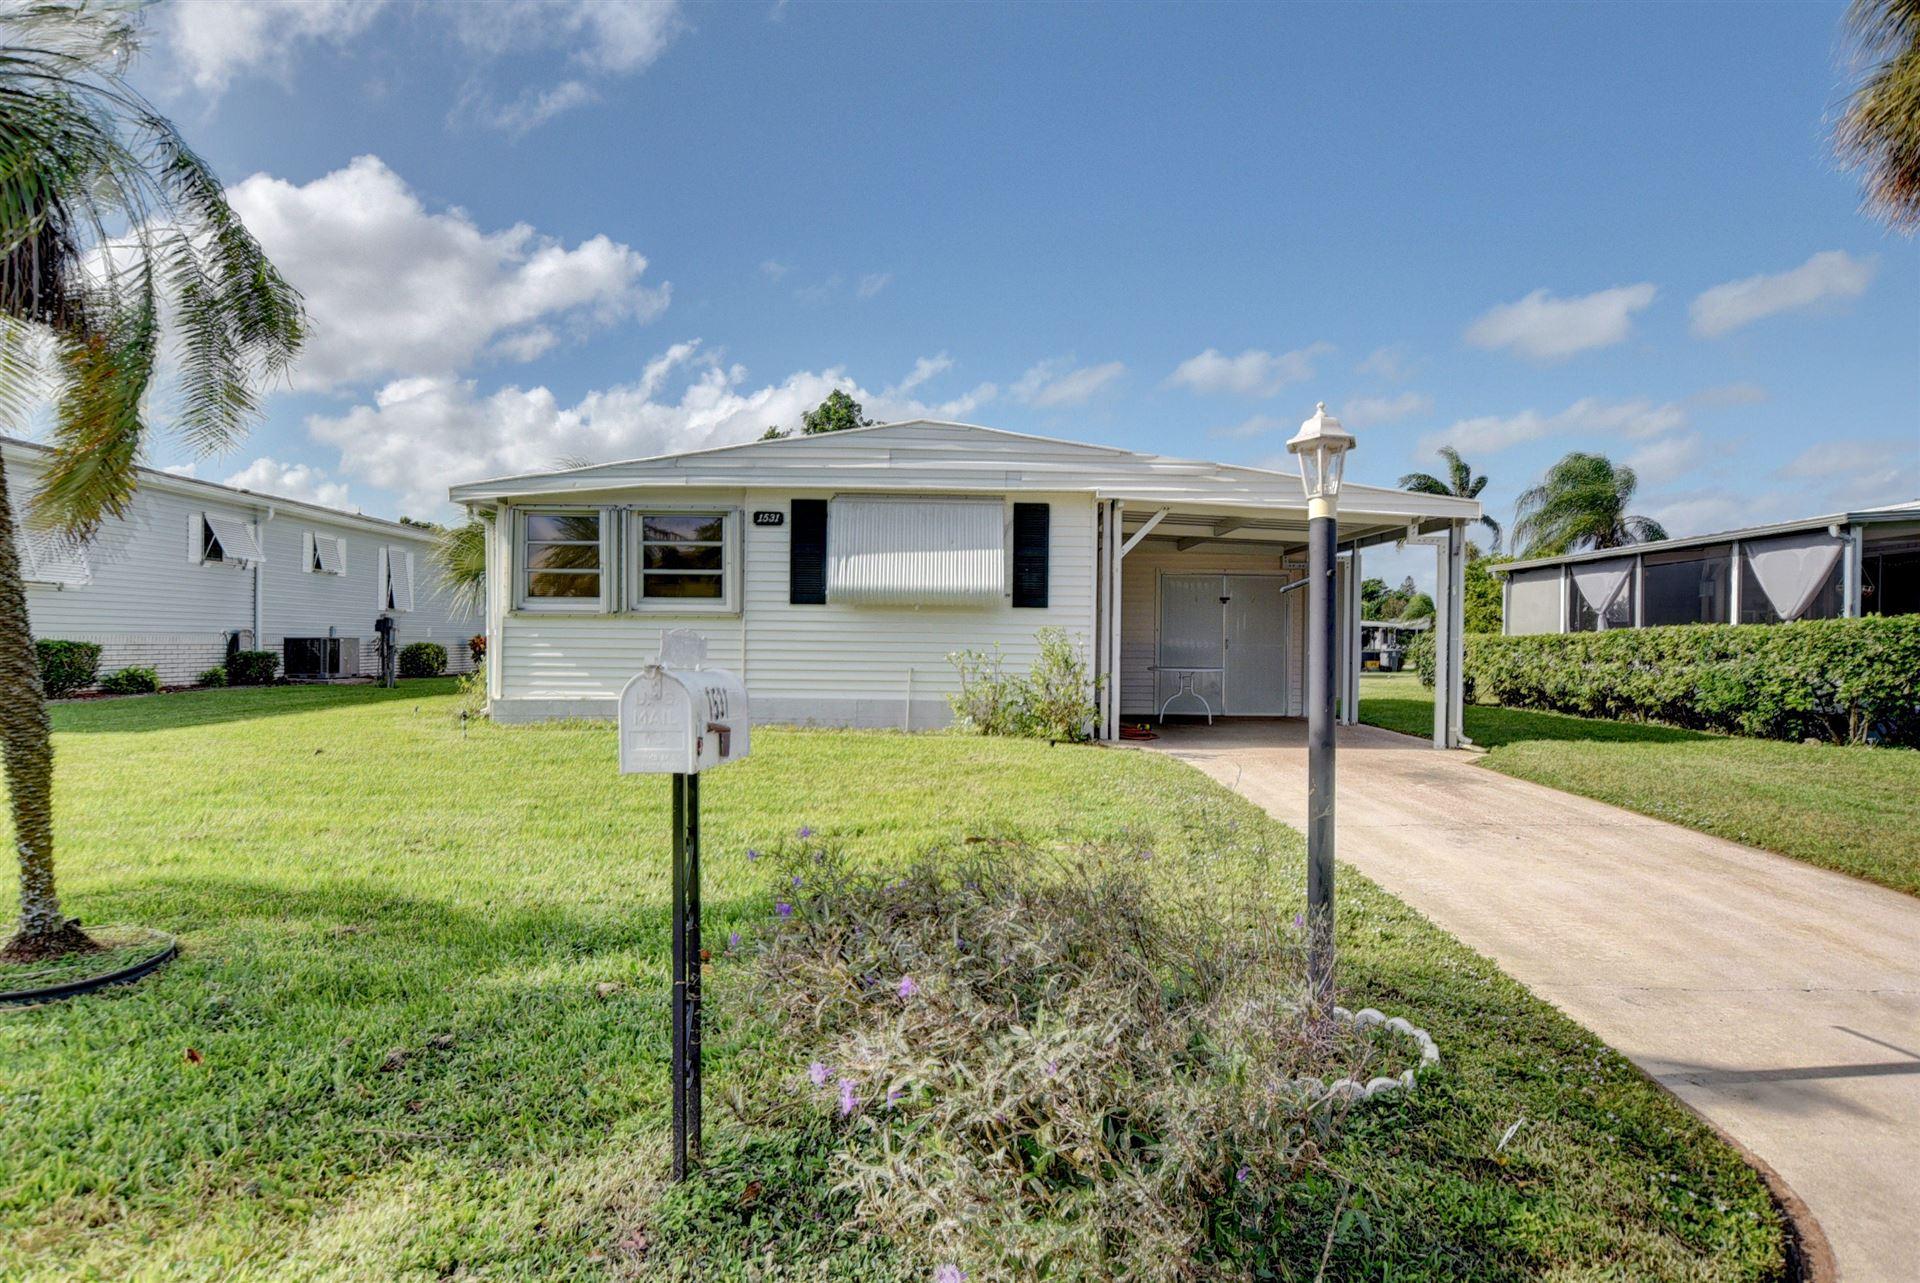 1531 SW 64th Way, Boca Raton, FL 33428 - #: RX-10675287